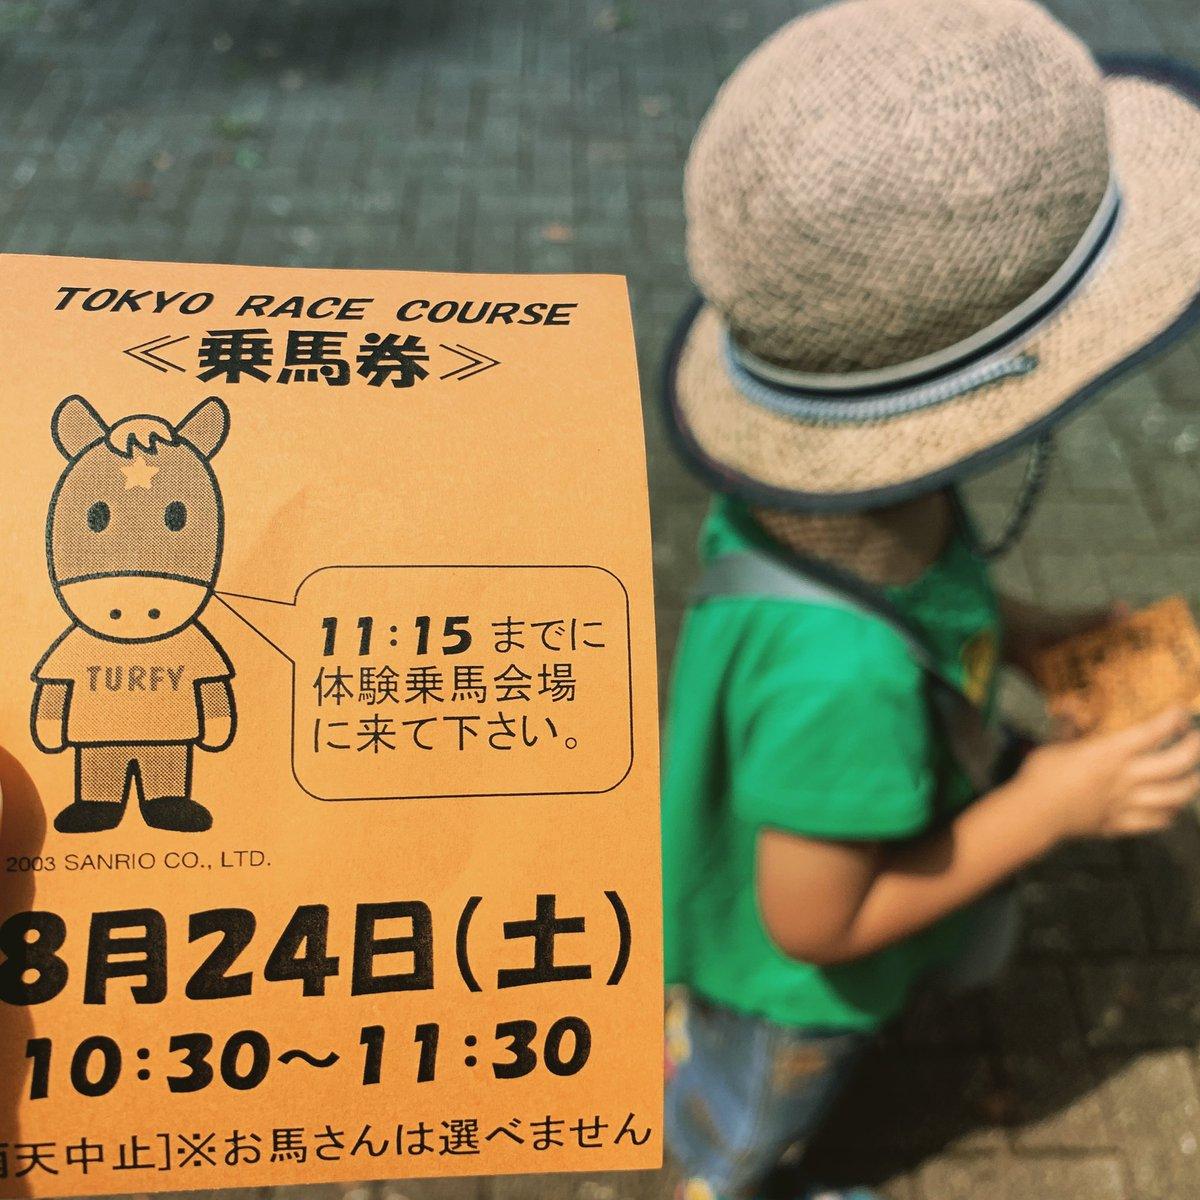 念願の✨  #馬  #乗馬  #競馬  #東京競馬場  #府中競馬場  #府中  #乗馬体験  #日吉ヶ丘公園  #家族でお出かけ  #4歳児